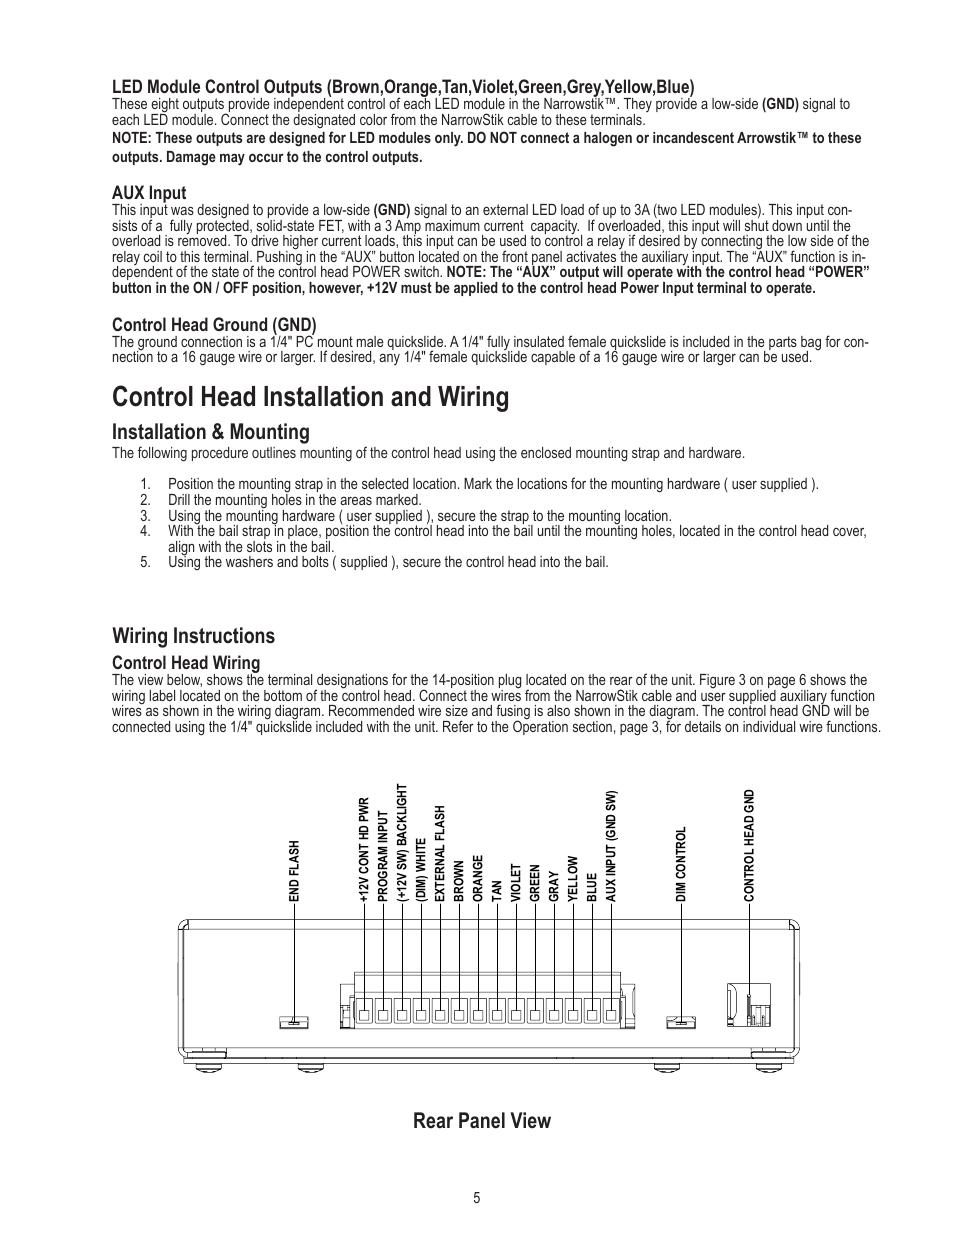 Led X 2100 Wiring Diagram - Schematics Online Bar Control Wiring Diagram Hd on